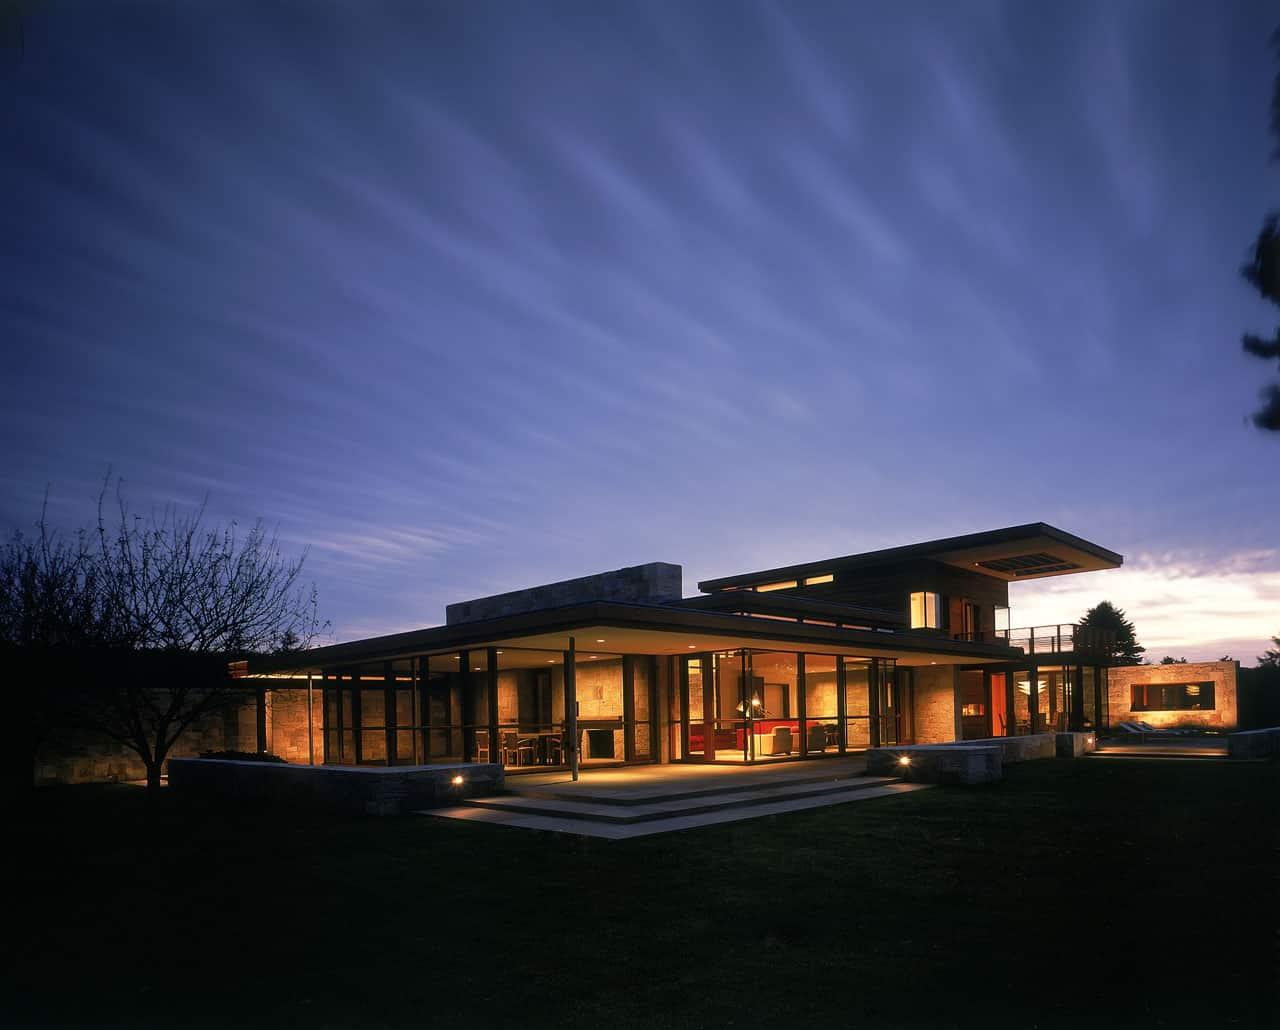 The Stone Houses by Leroy Street Studio